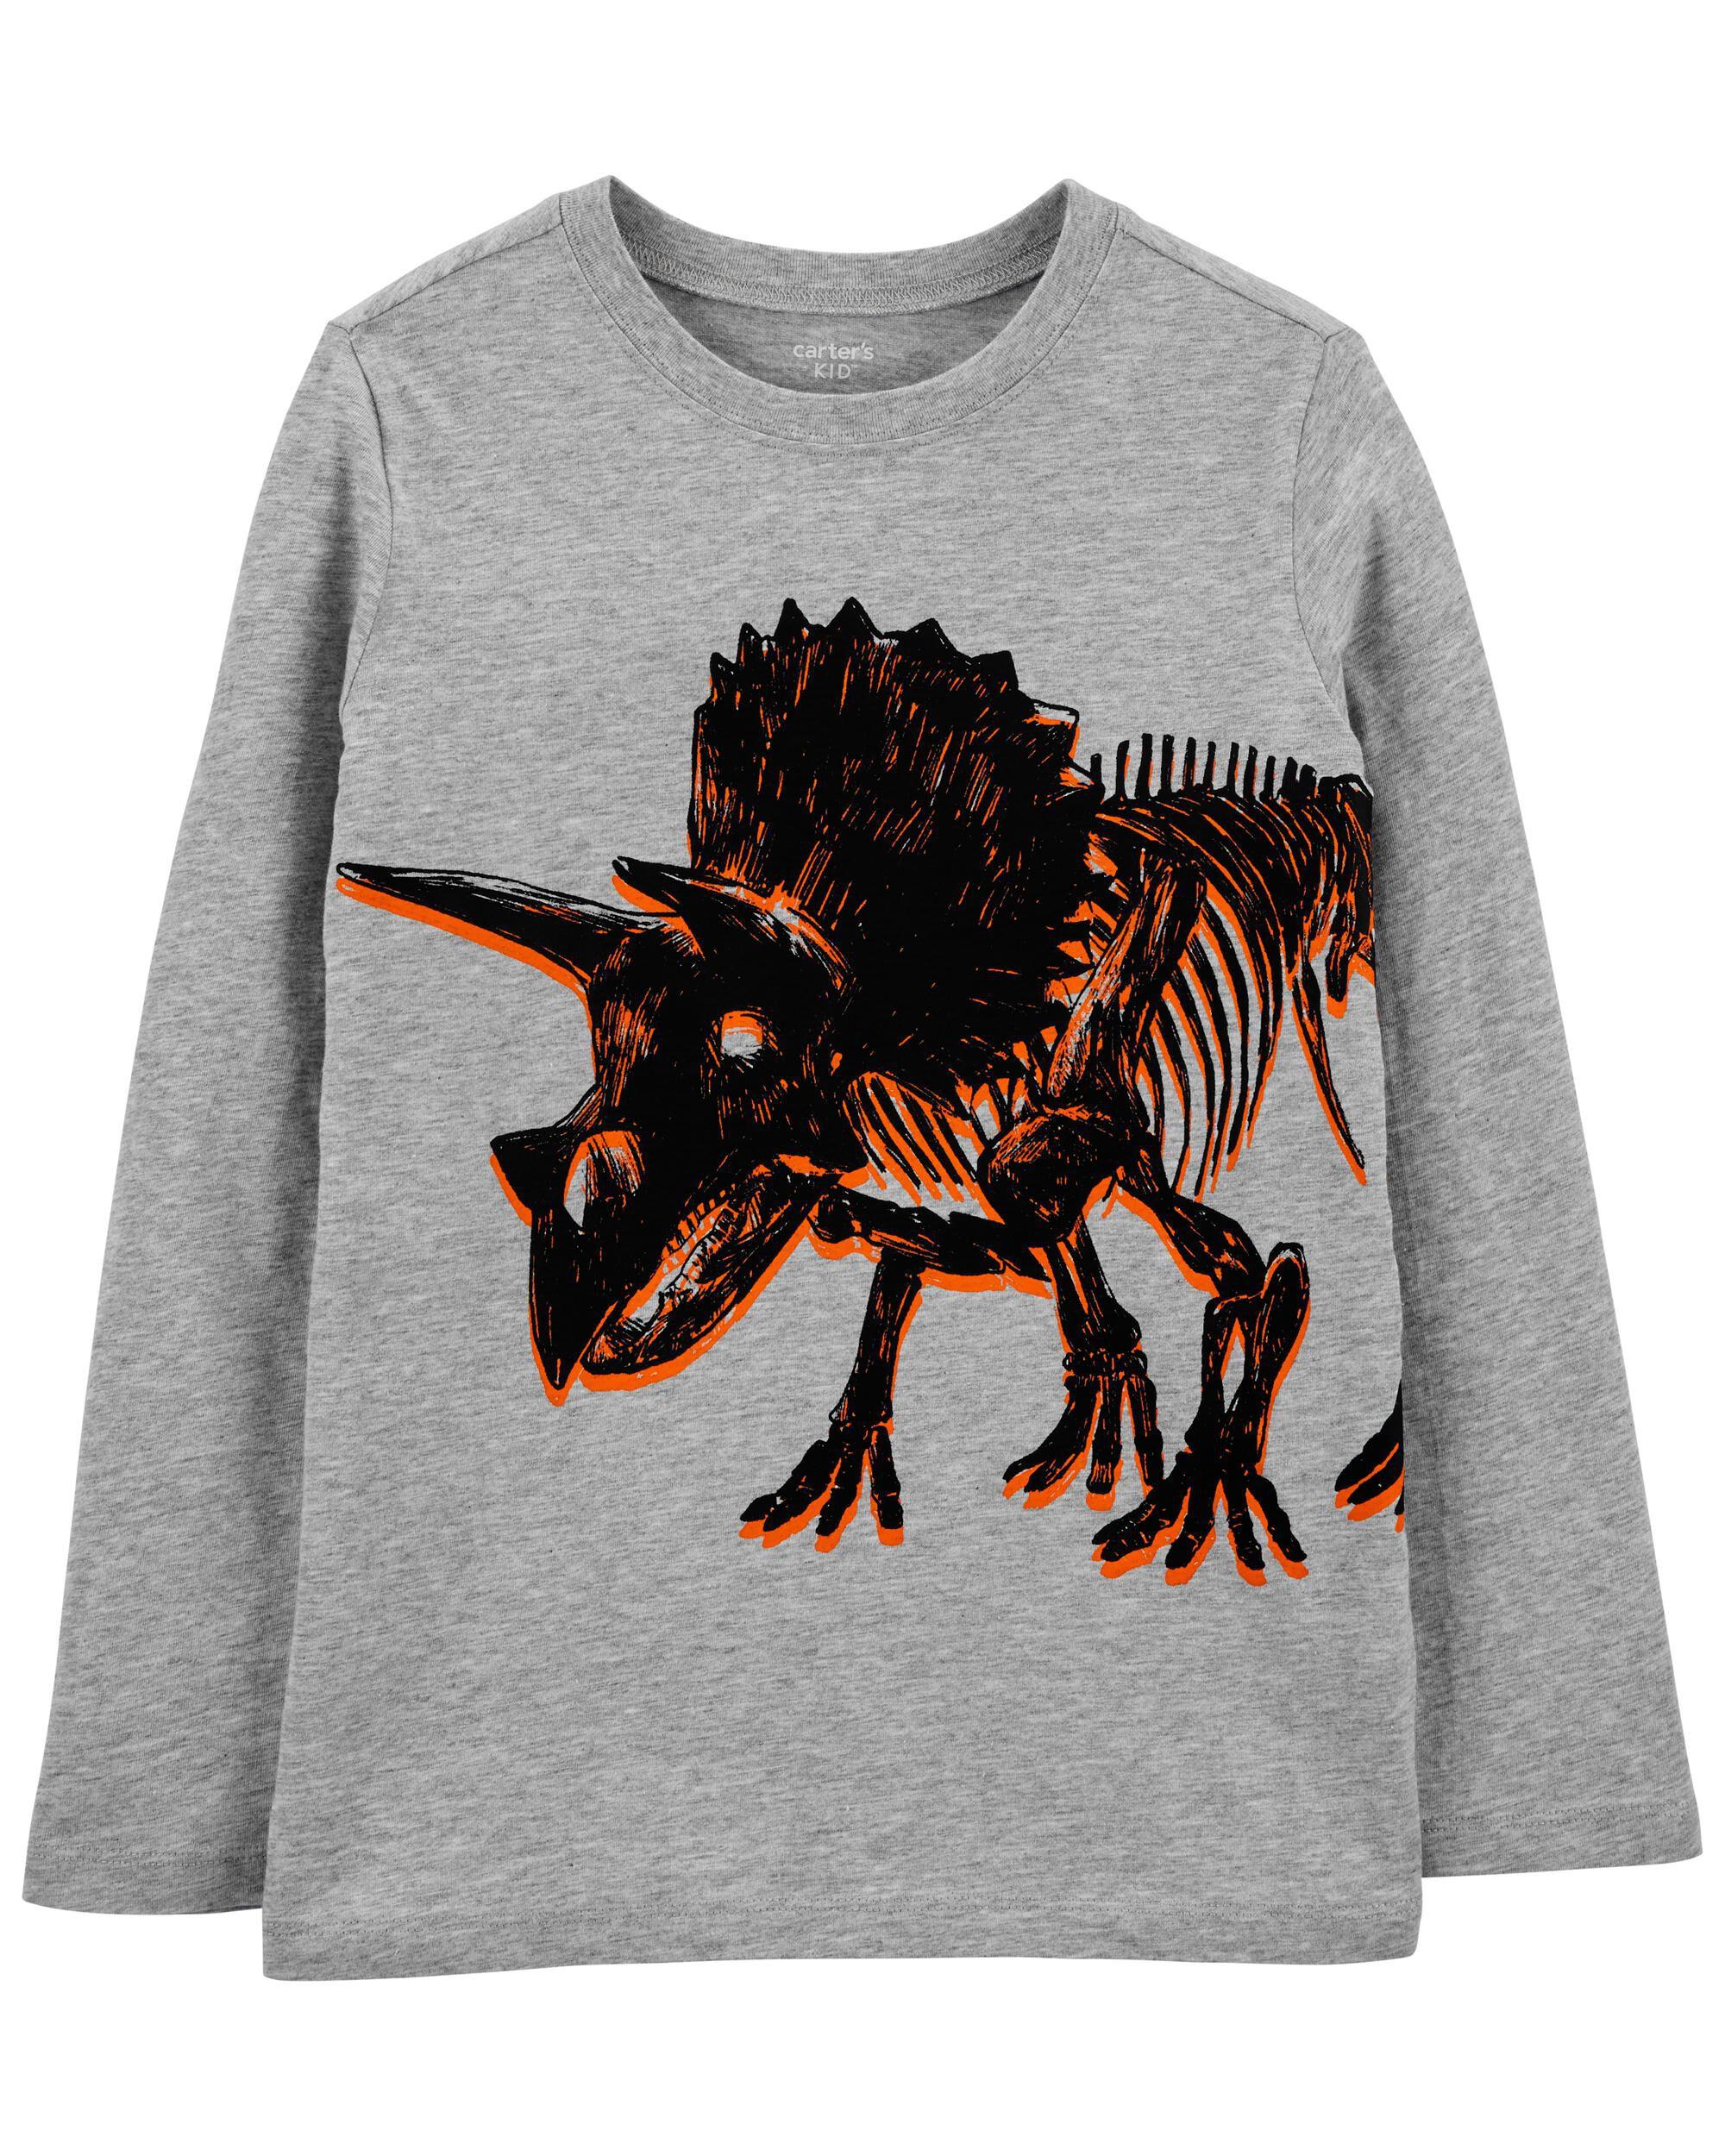 *CLEARANCE* Dinosaur Jersey Tee